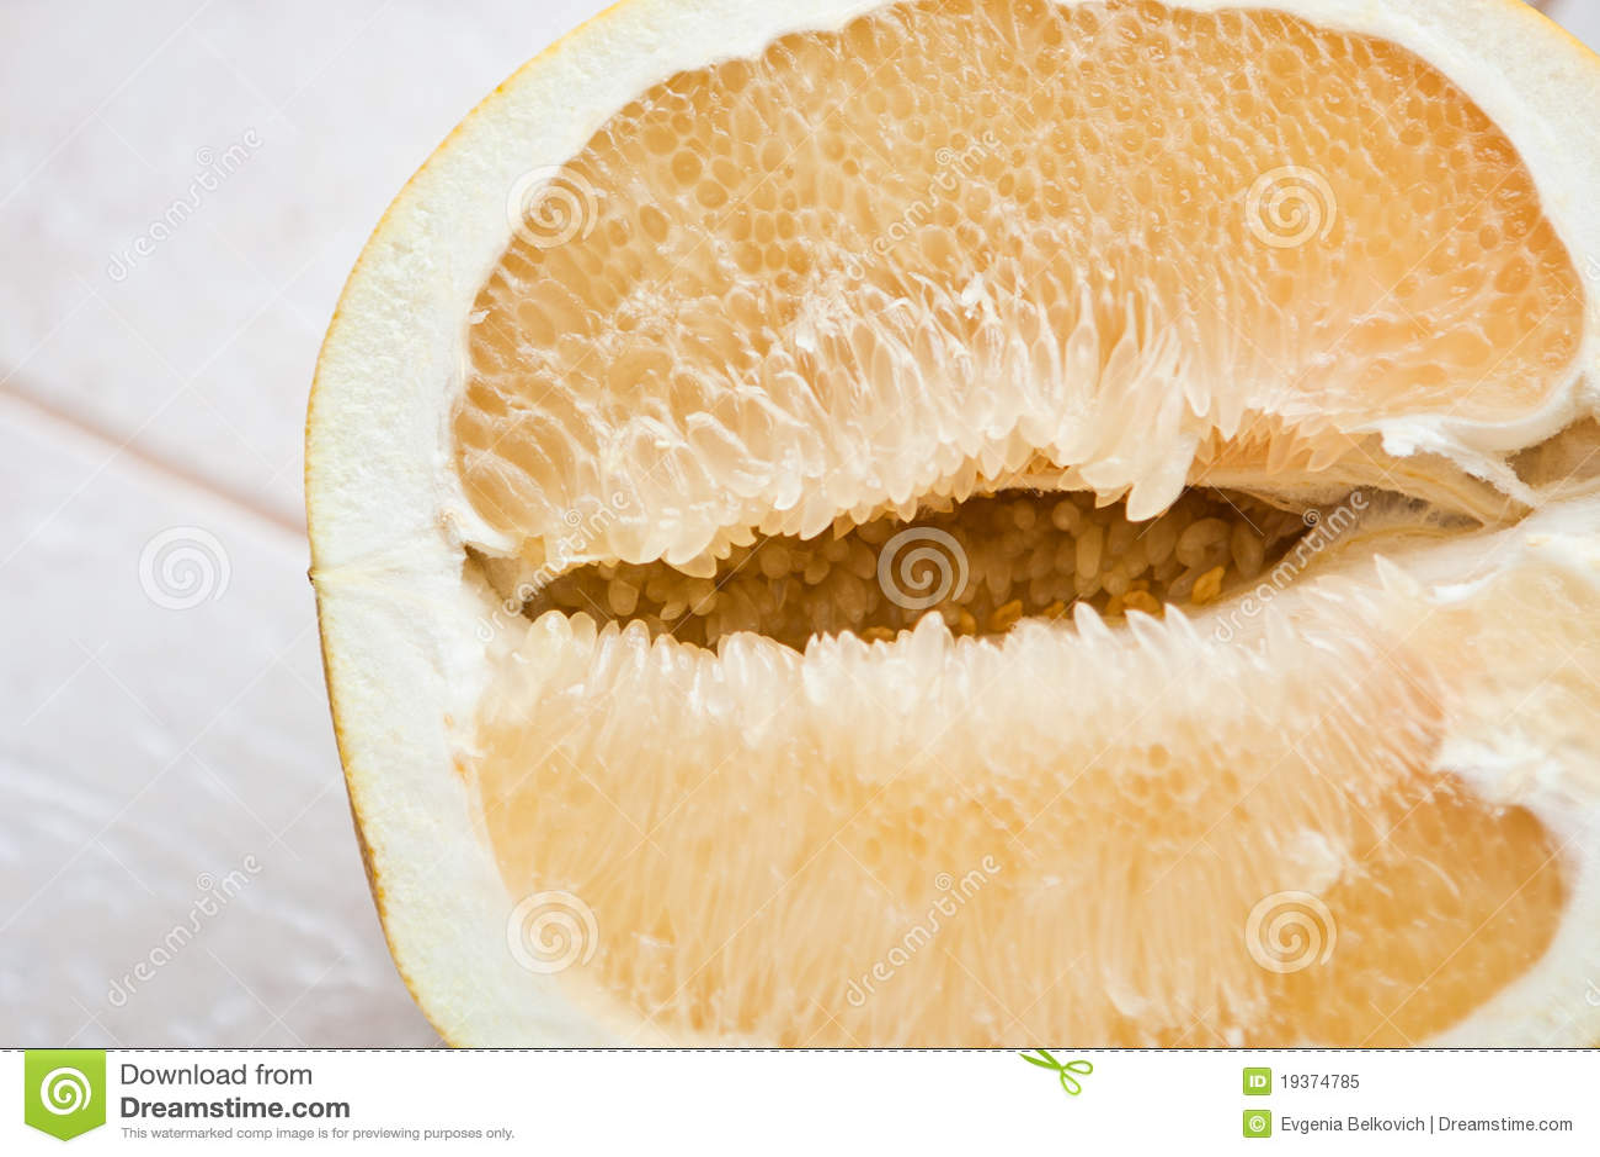 Ââgrapefruit cortado